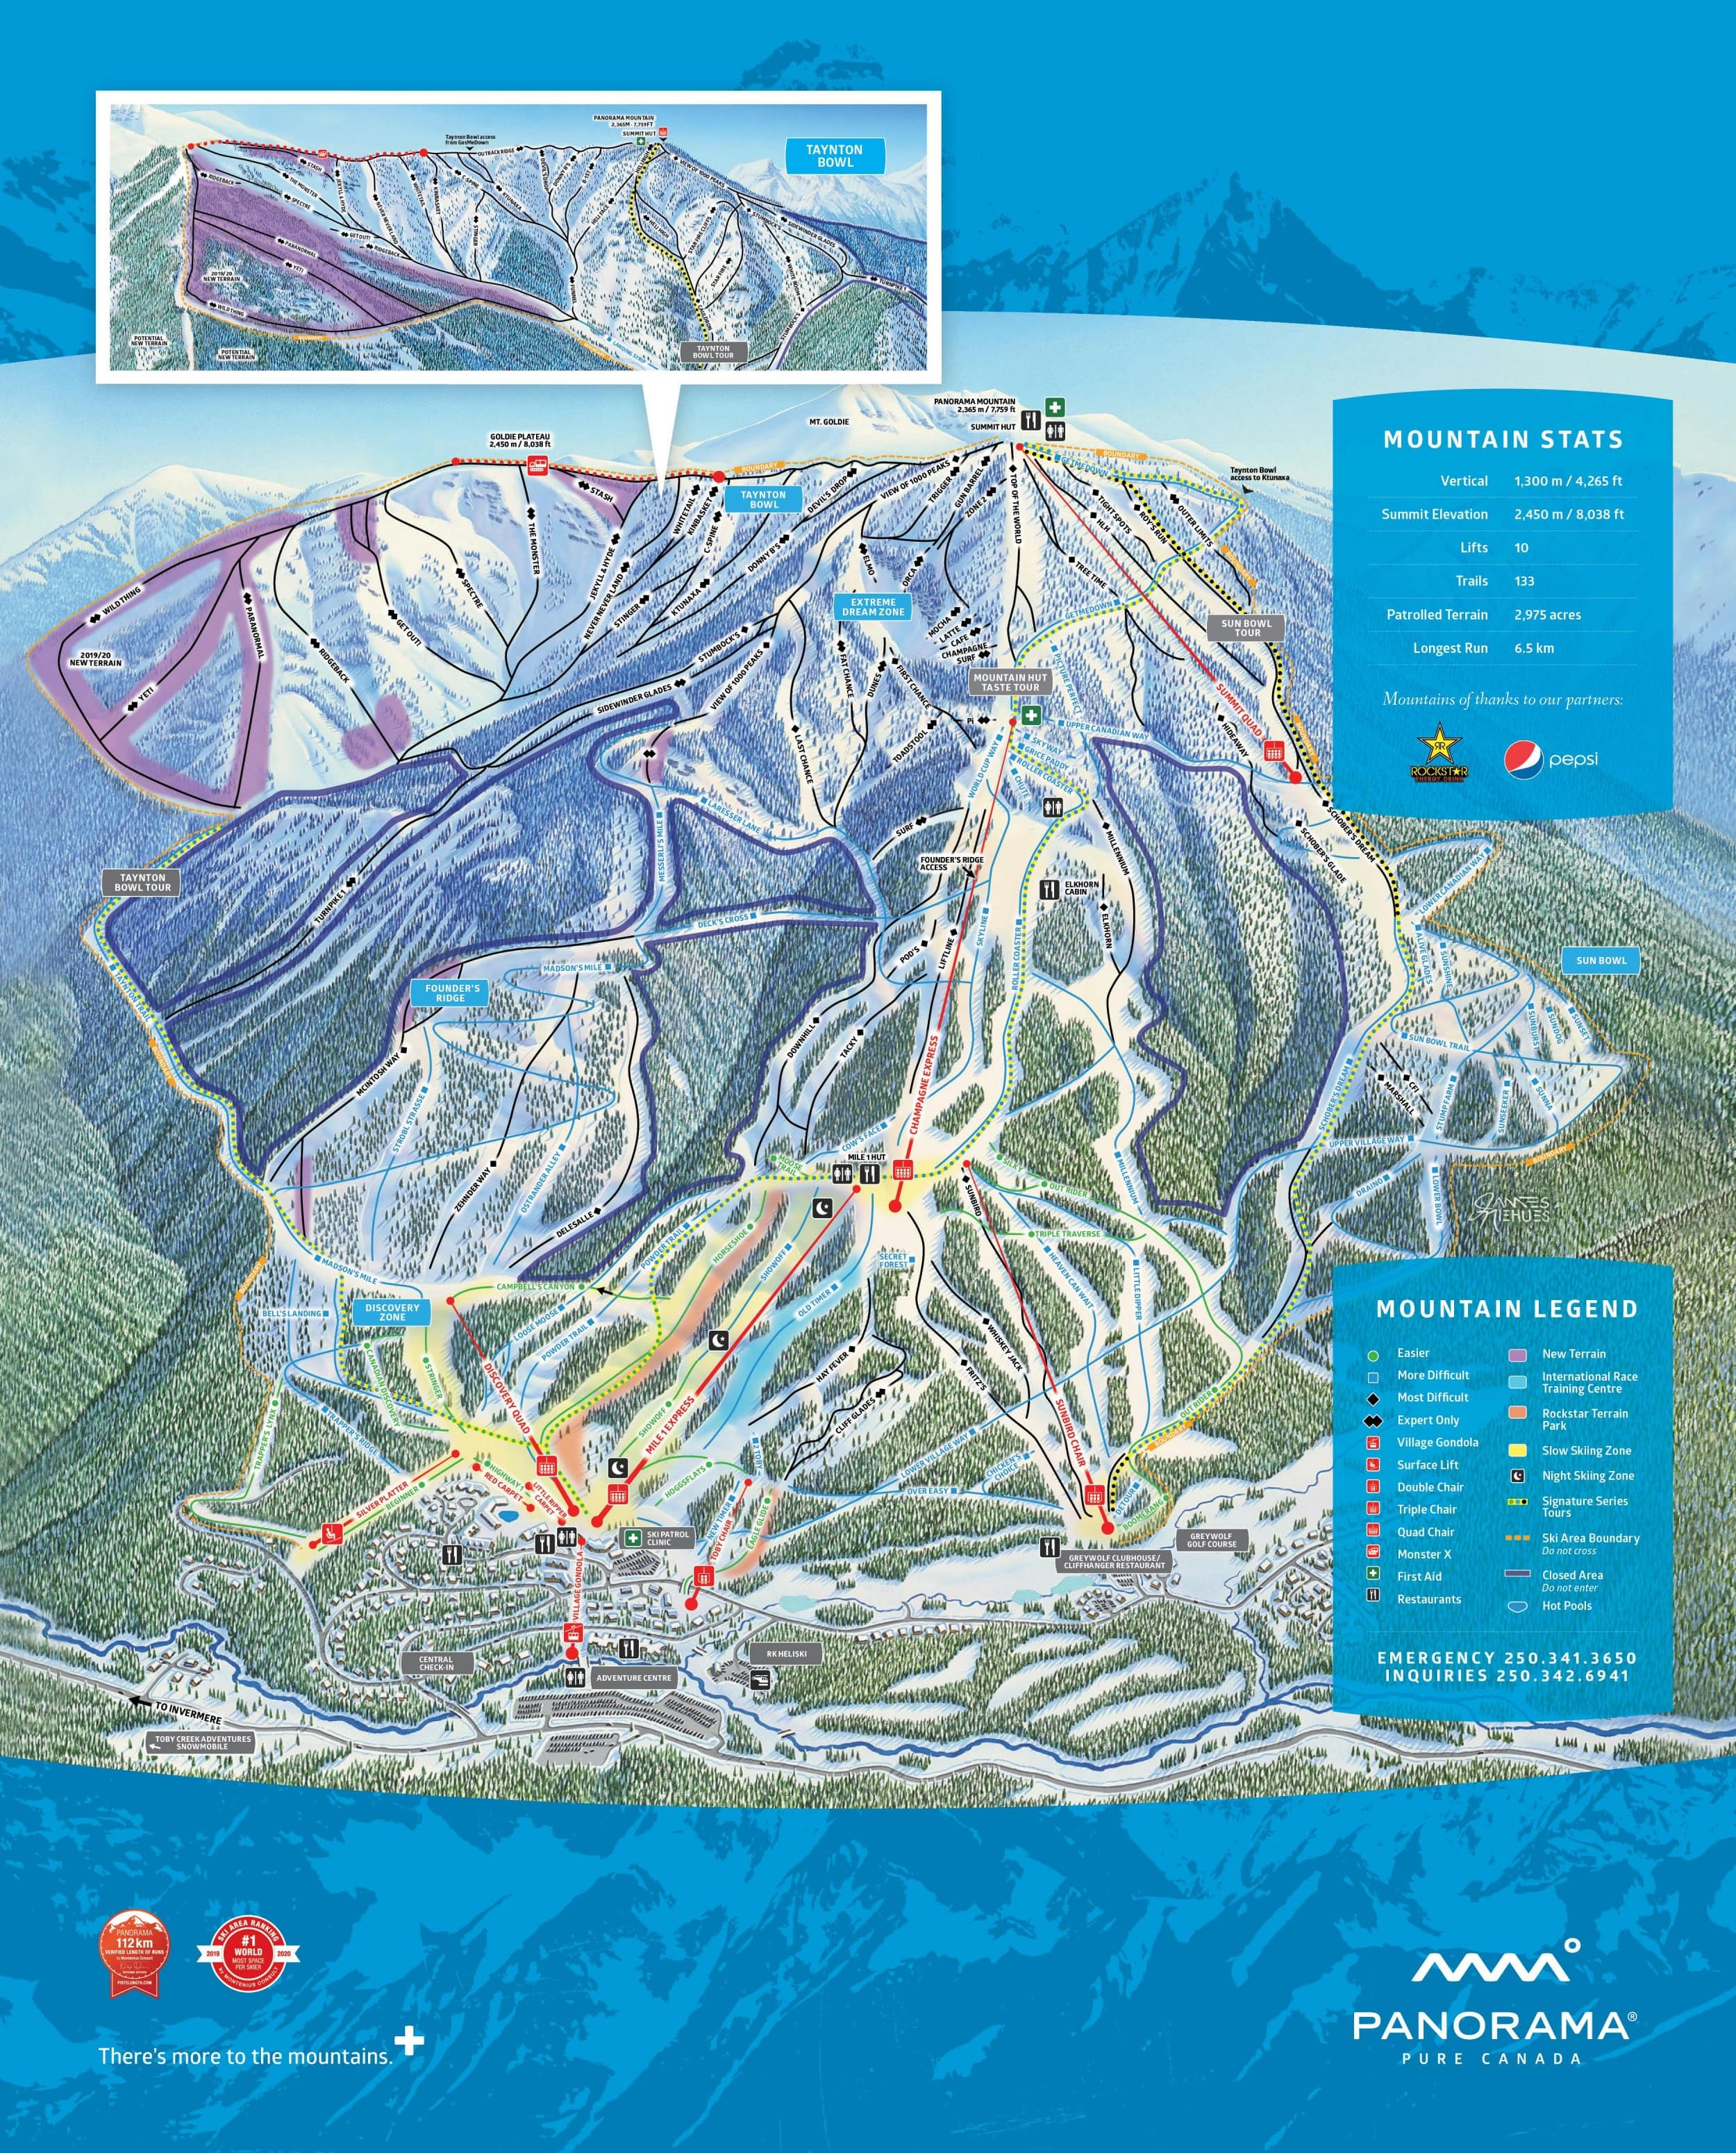 Panorama Mountain Resort Ski Resort Guide Location Map Amp Panorama Mountain Resort Ski Holiday